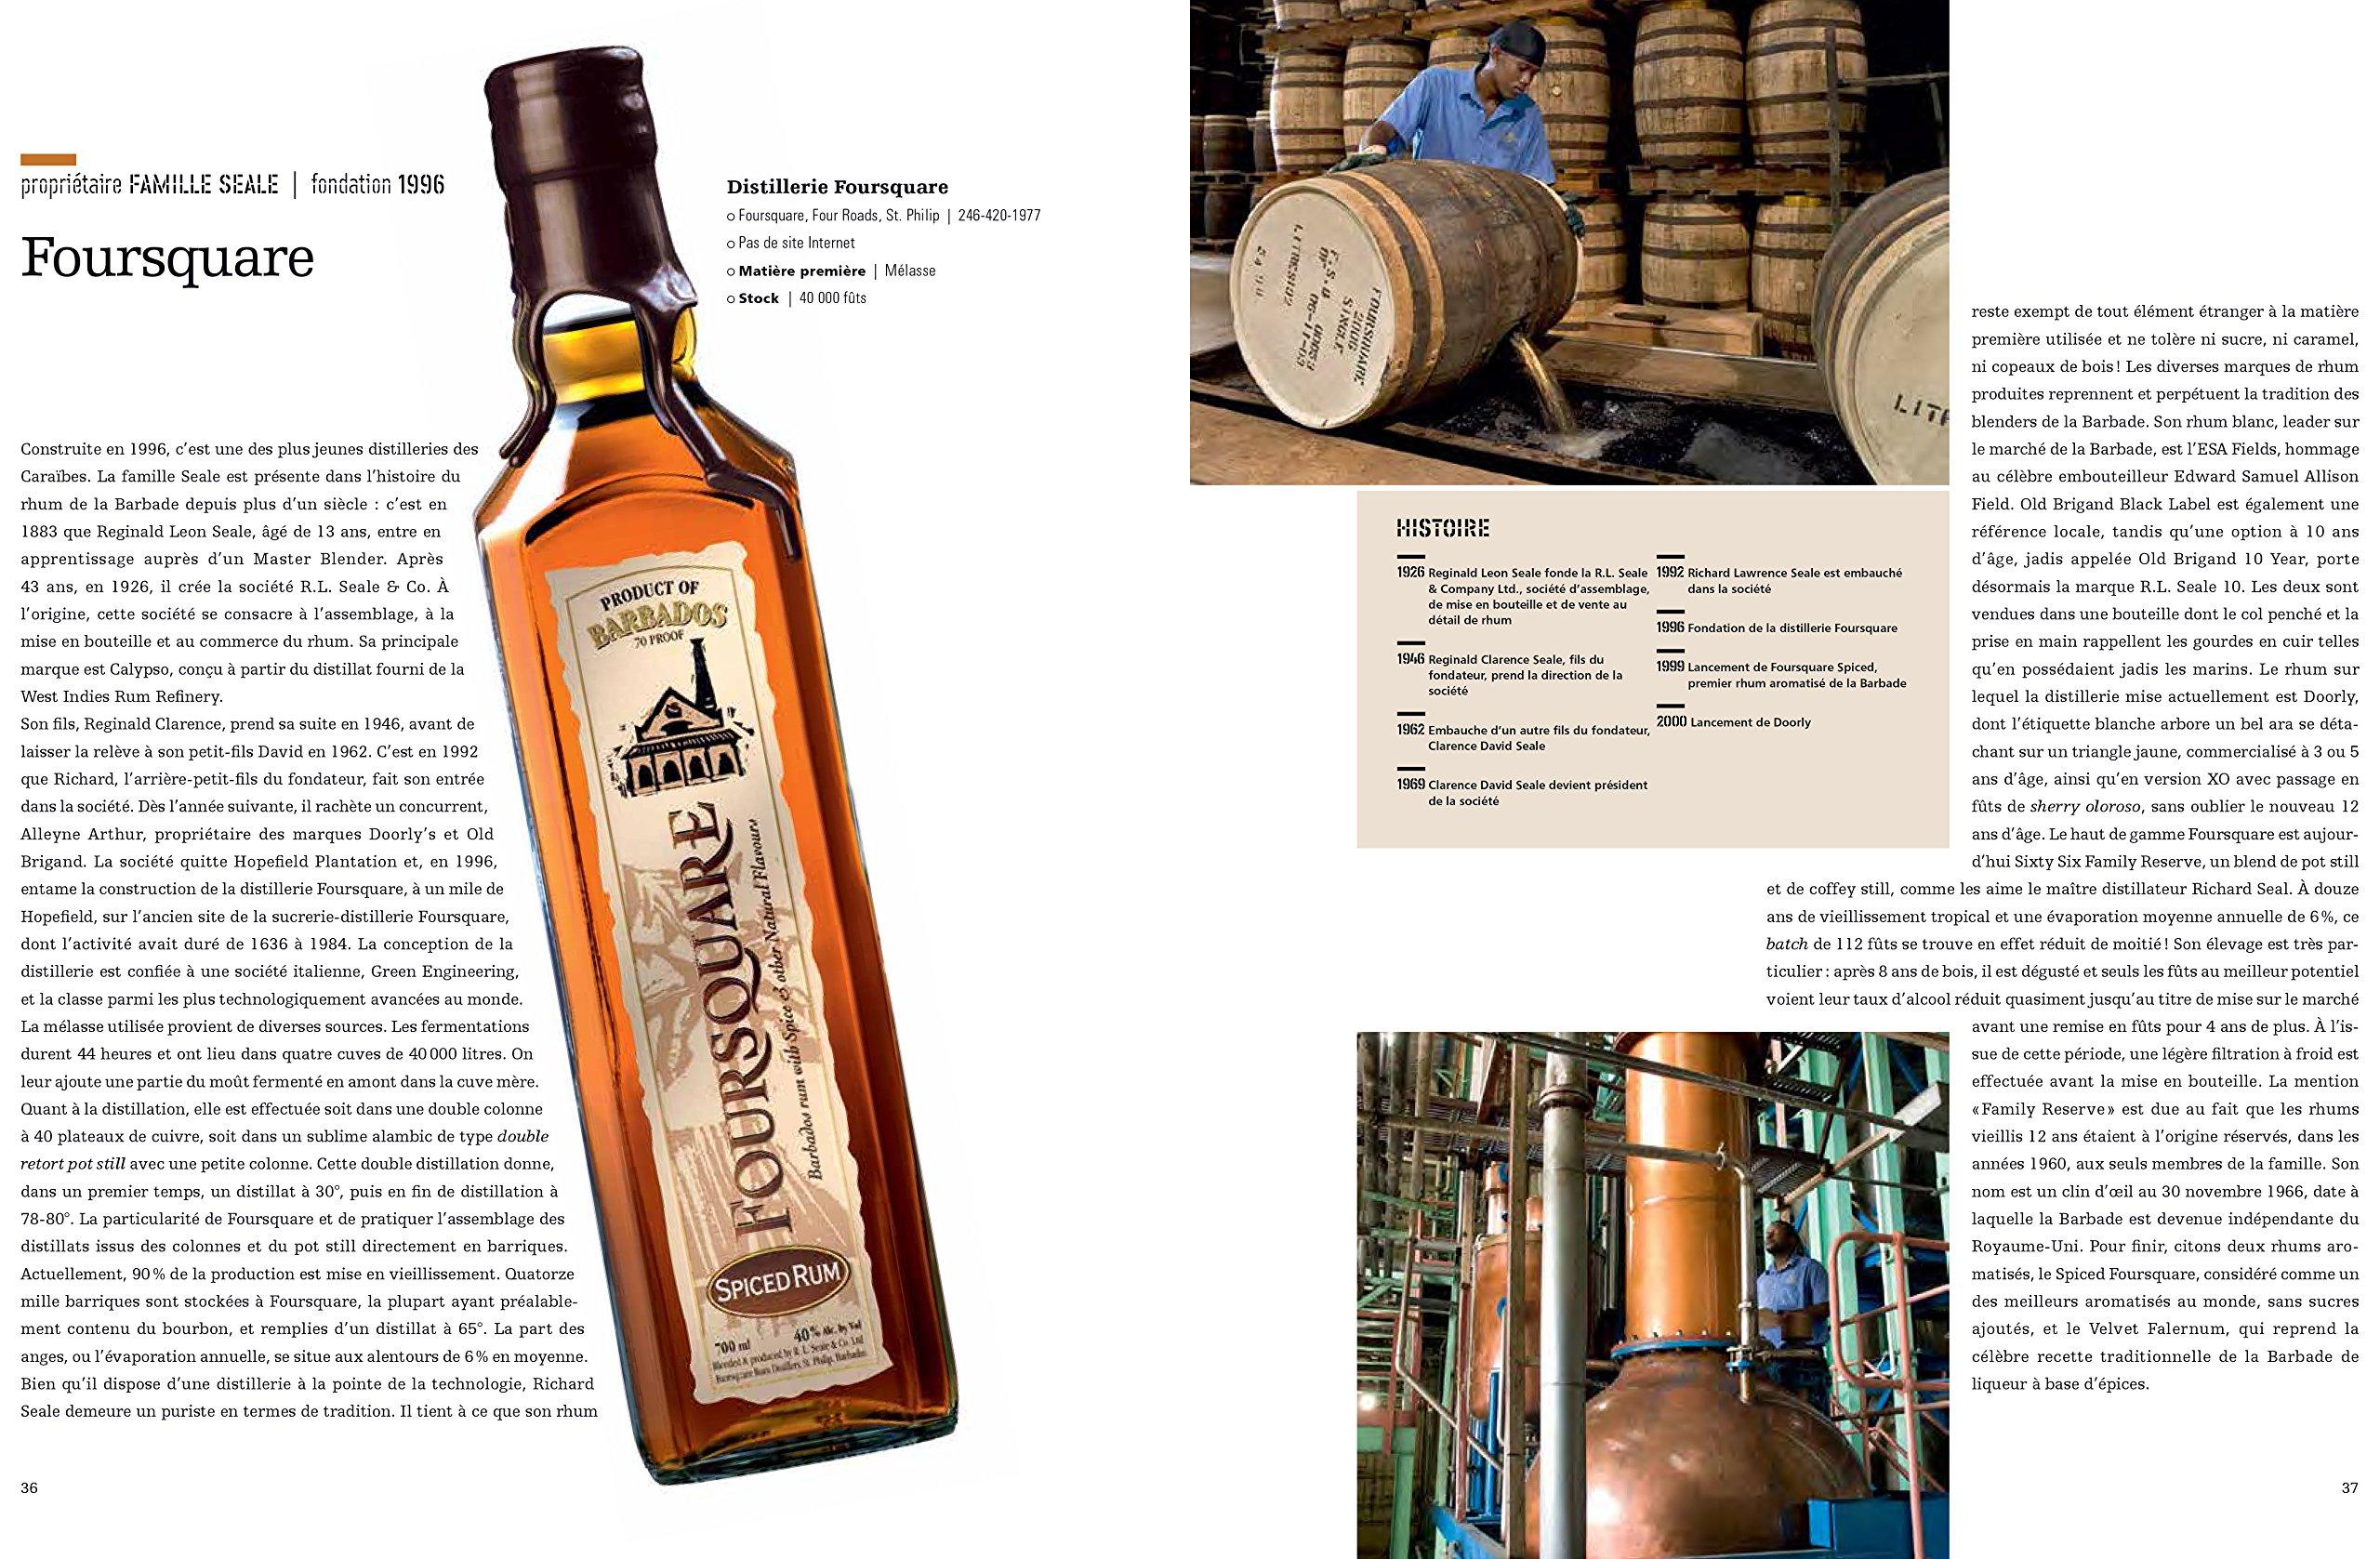 Atlas du rhum - distilleries des Caraïbes et degustation ...